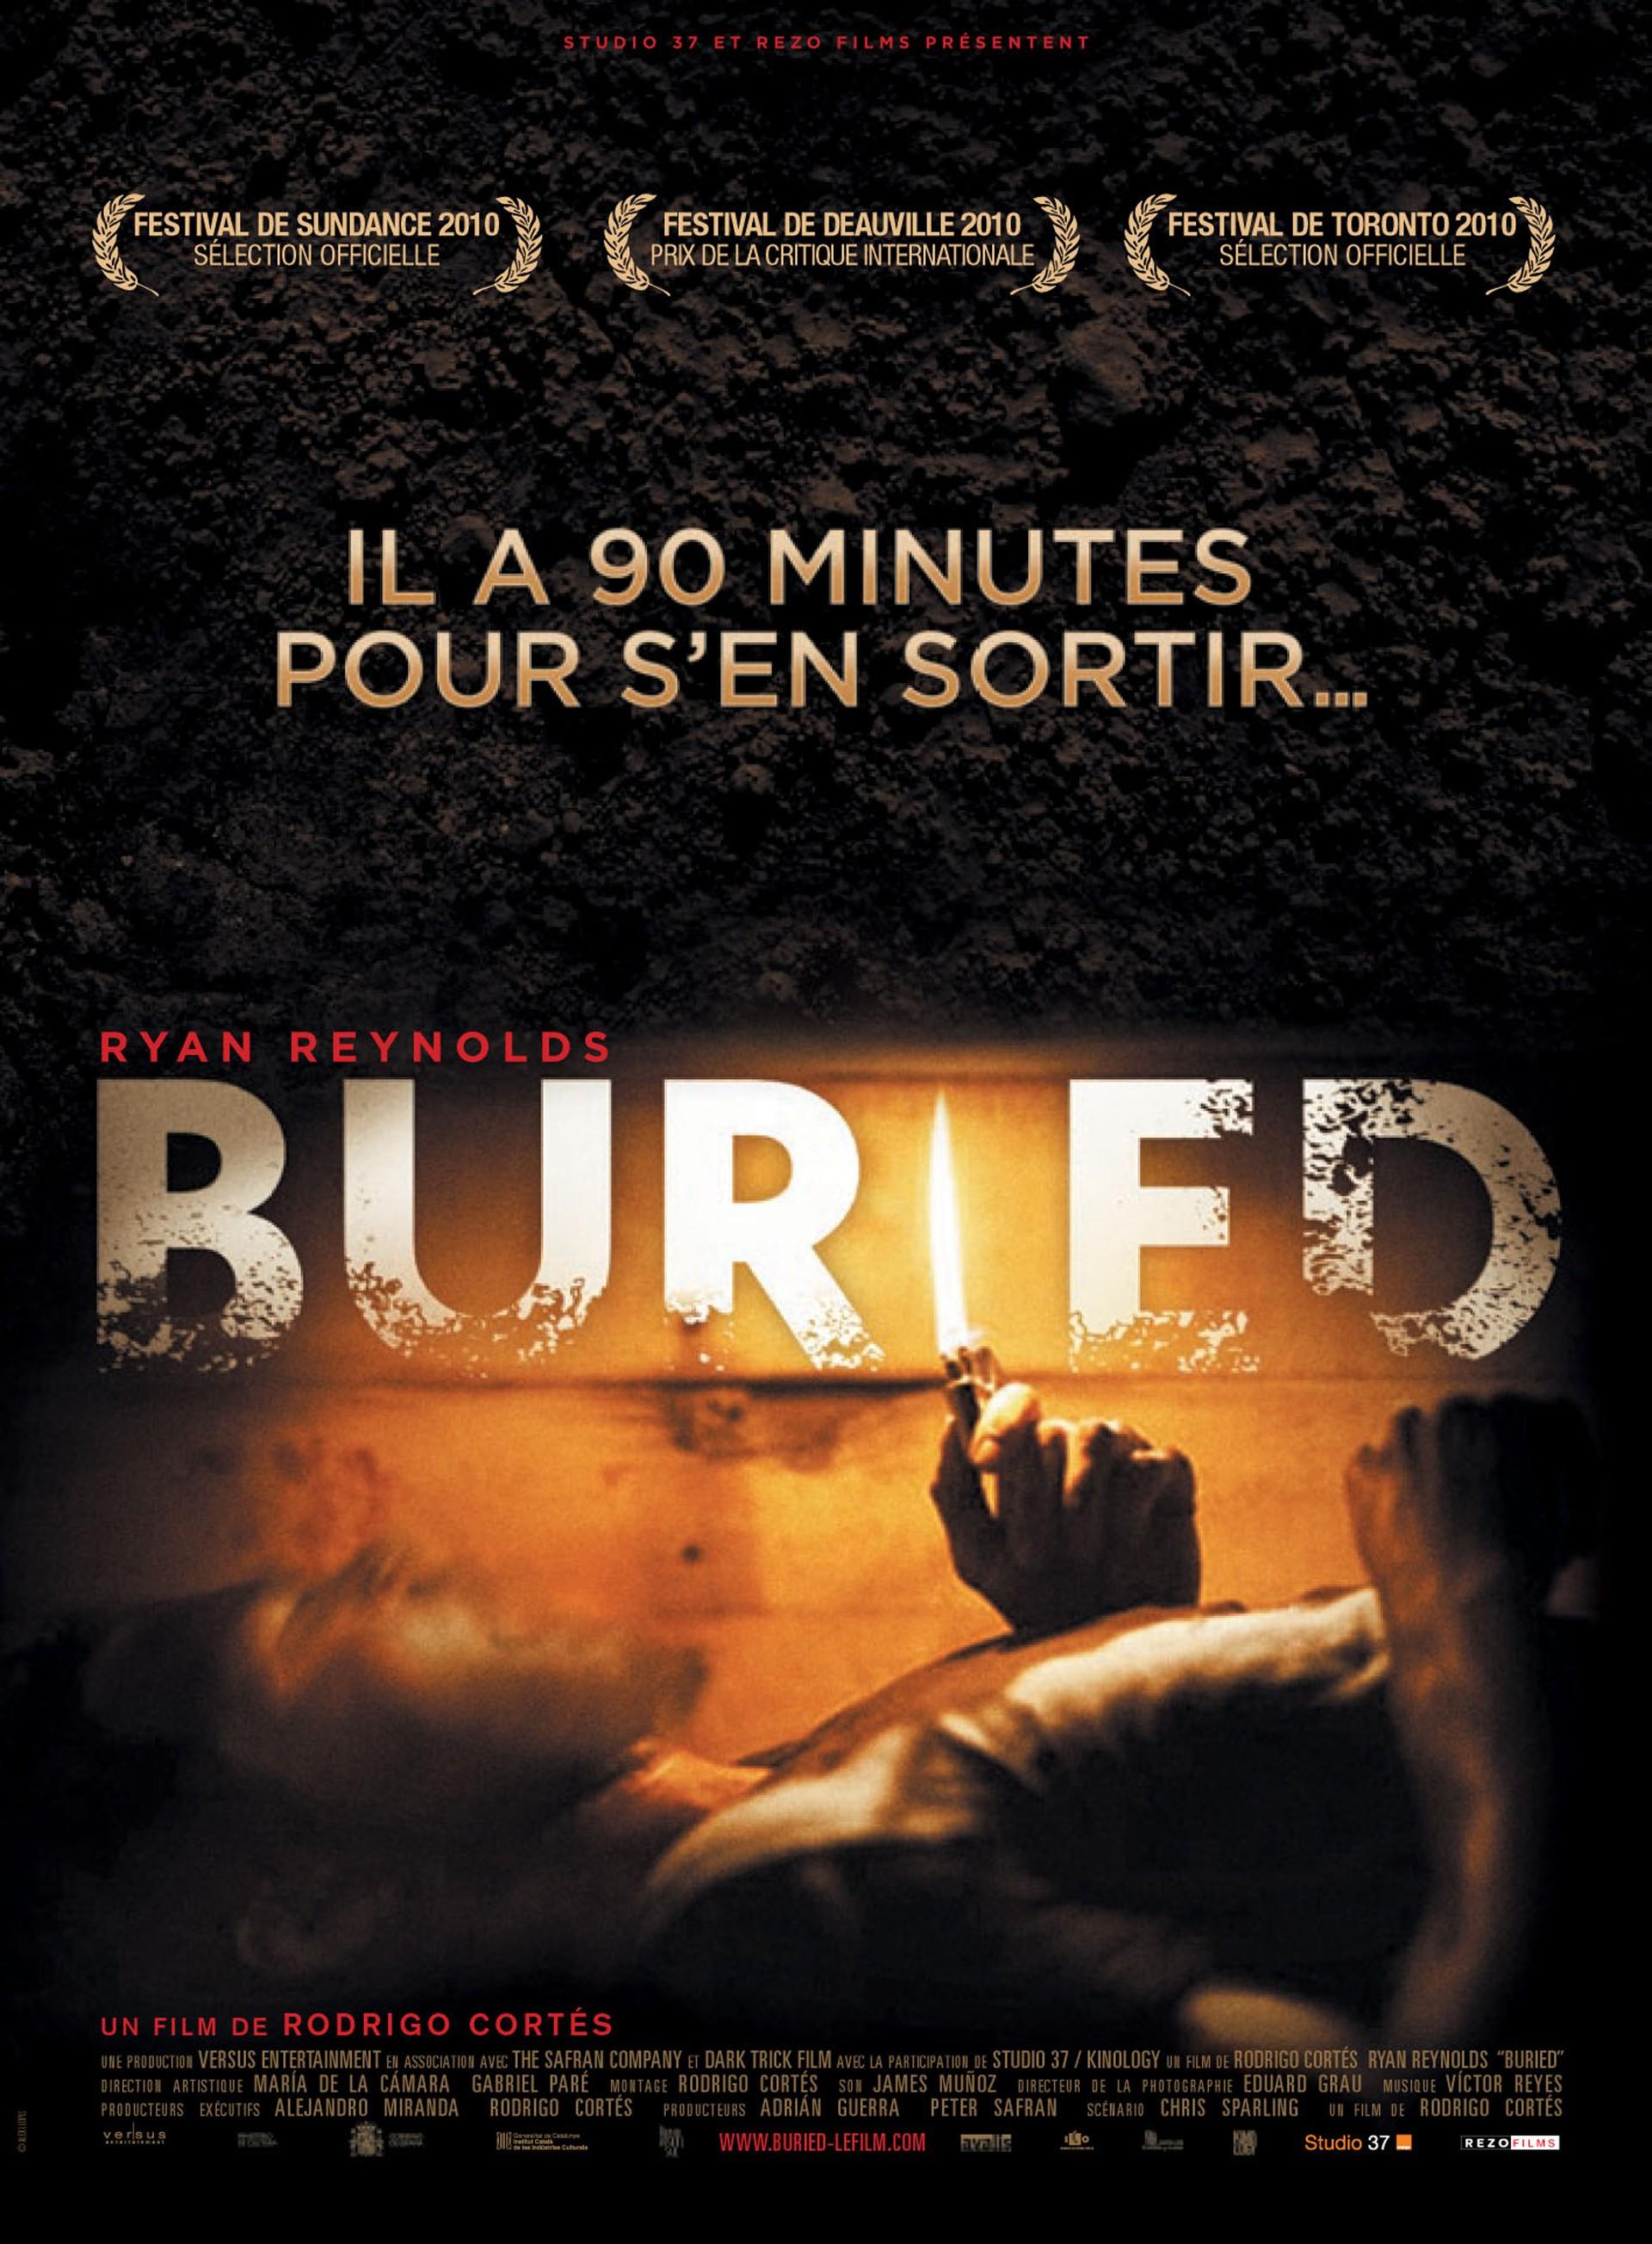 [MULTI] Buried [DVDRiP - TRUEFRENCH]